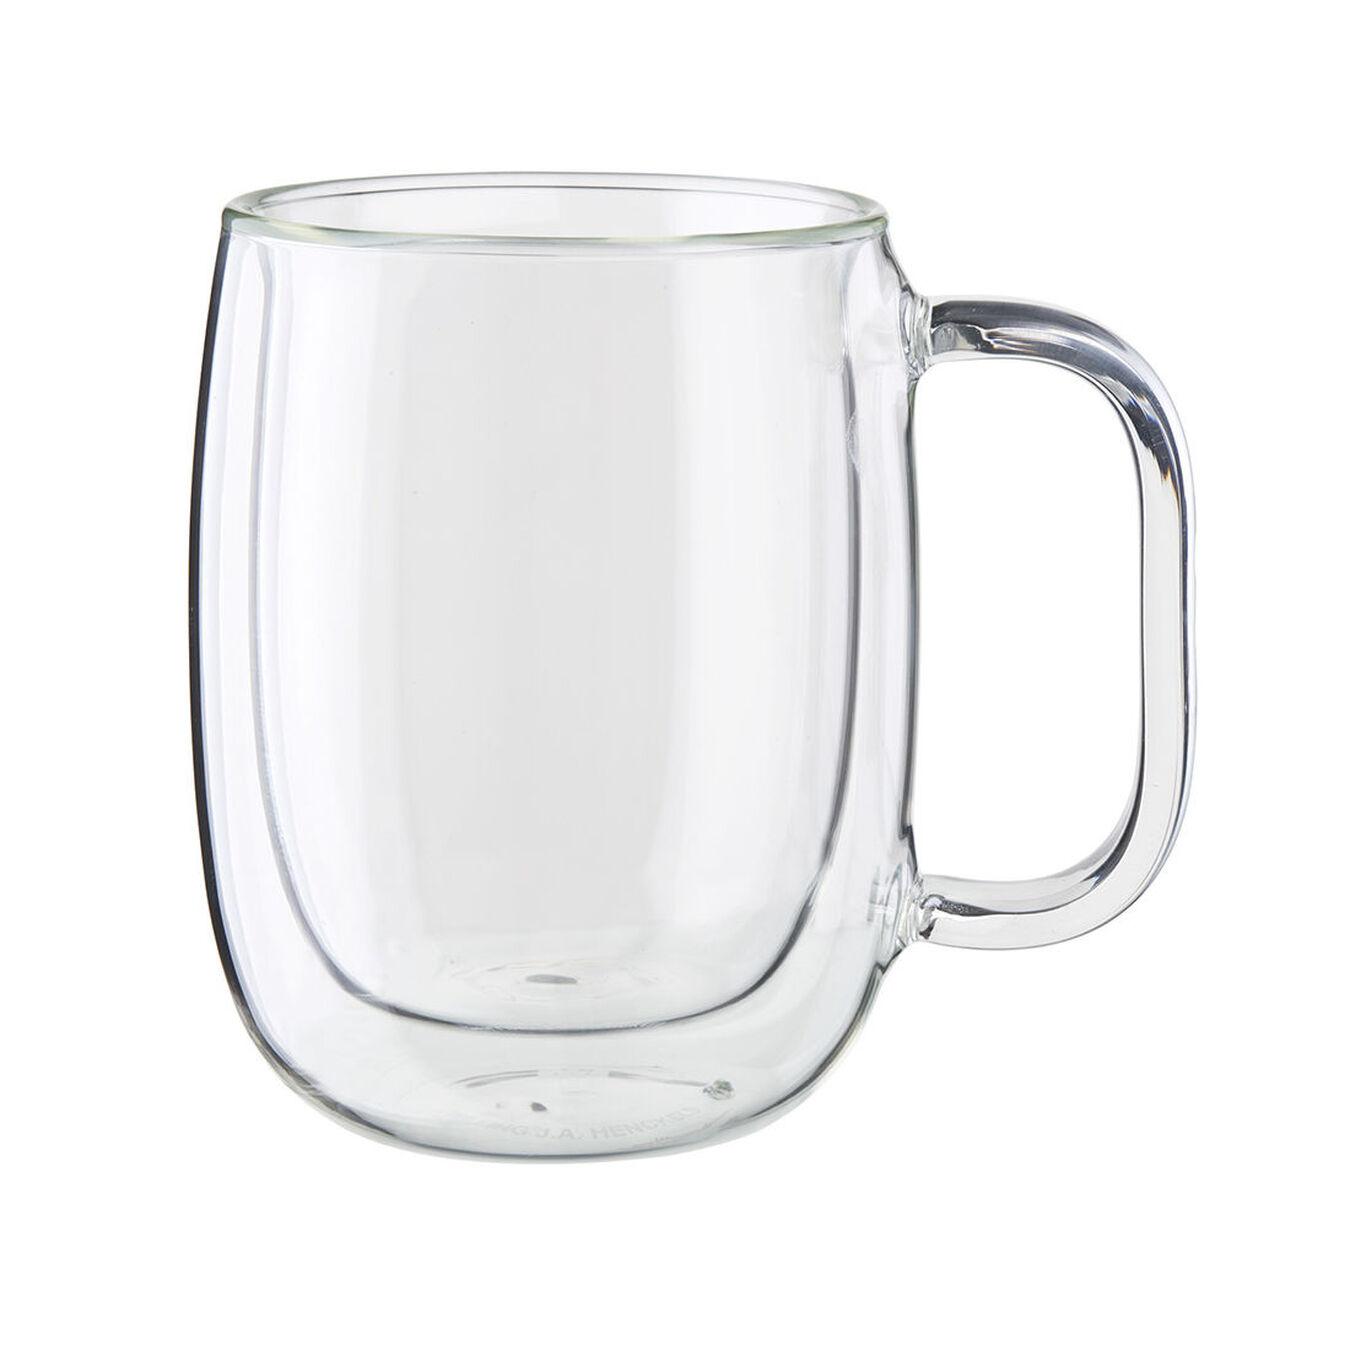 4-pc, Coffee glass set,,large 3